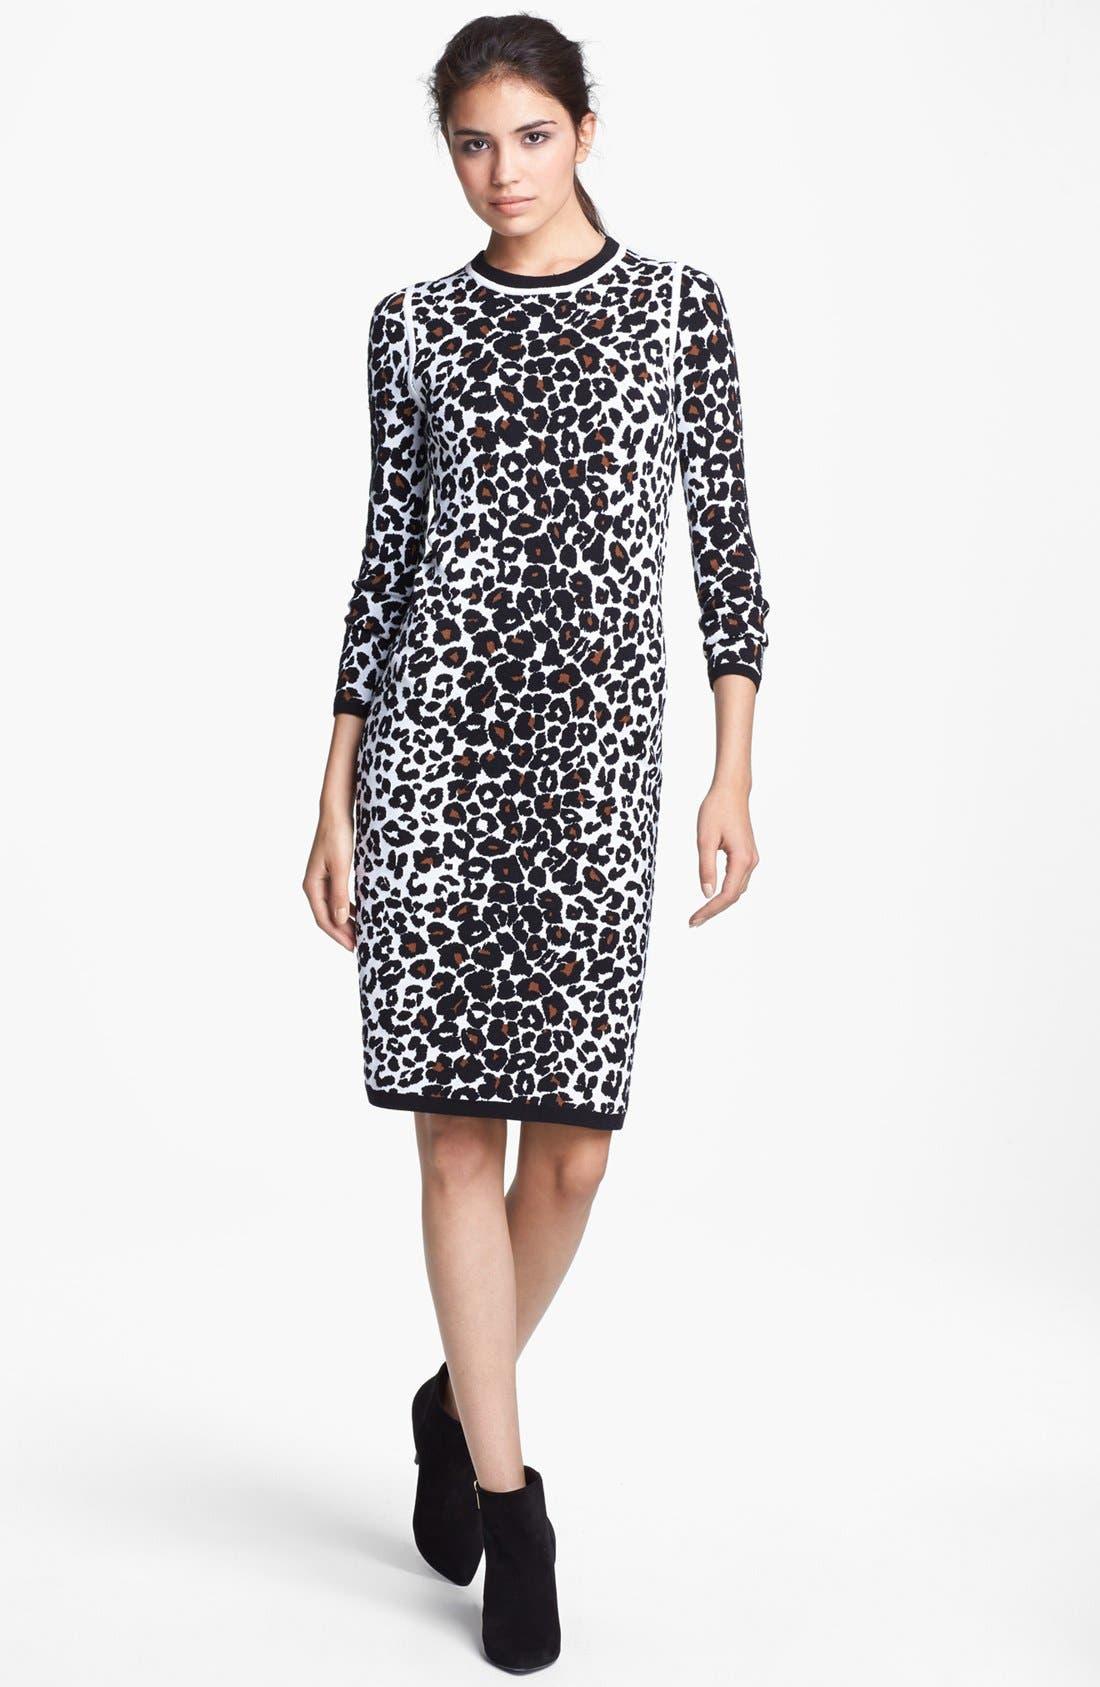 Alternate Image 1 Selected - A.L.C. 'Smith' Long Sleeve Leopard Pattern Knit Dress